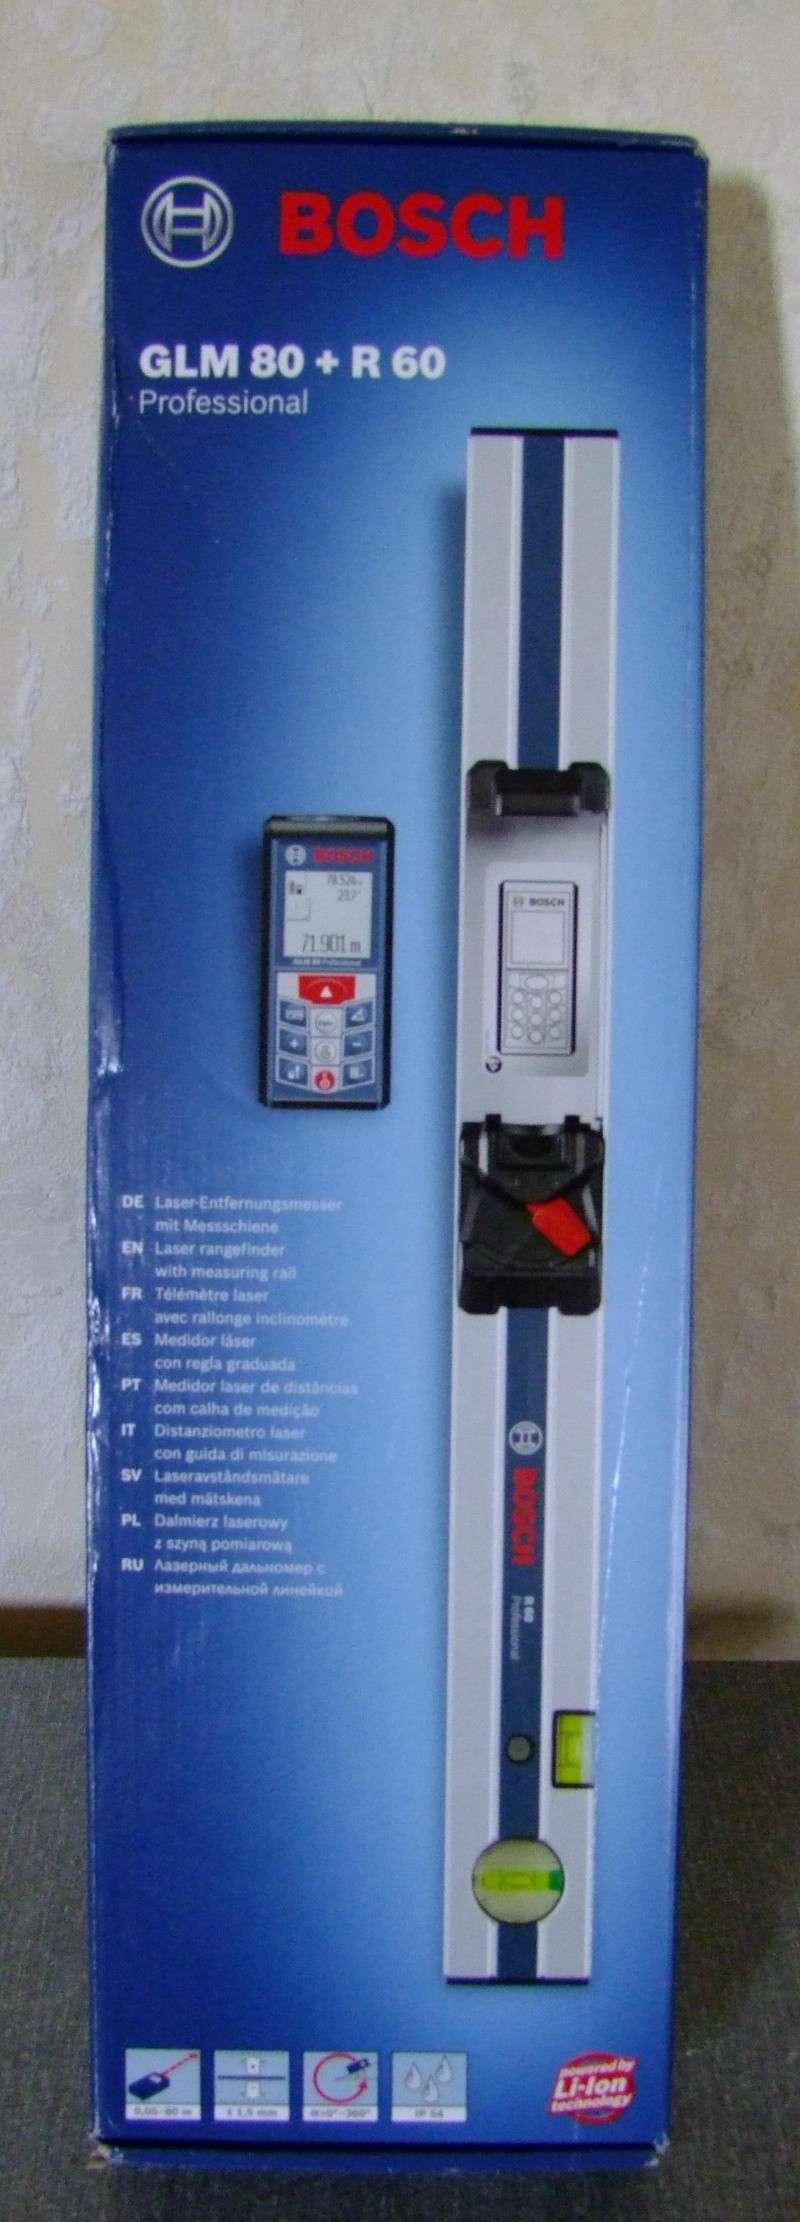 Télémêtre laser BOSCH GLM80 + R60 Dscf5010